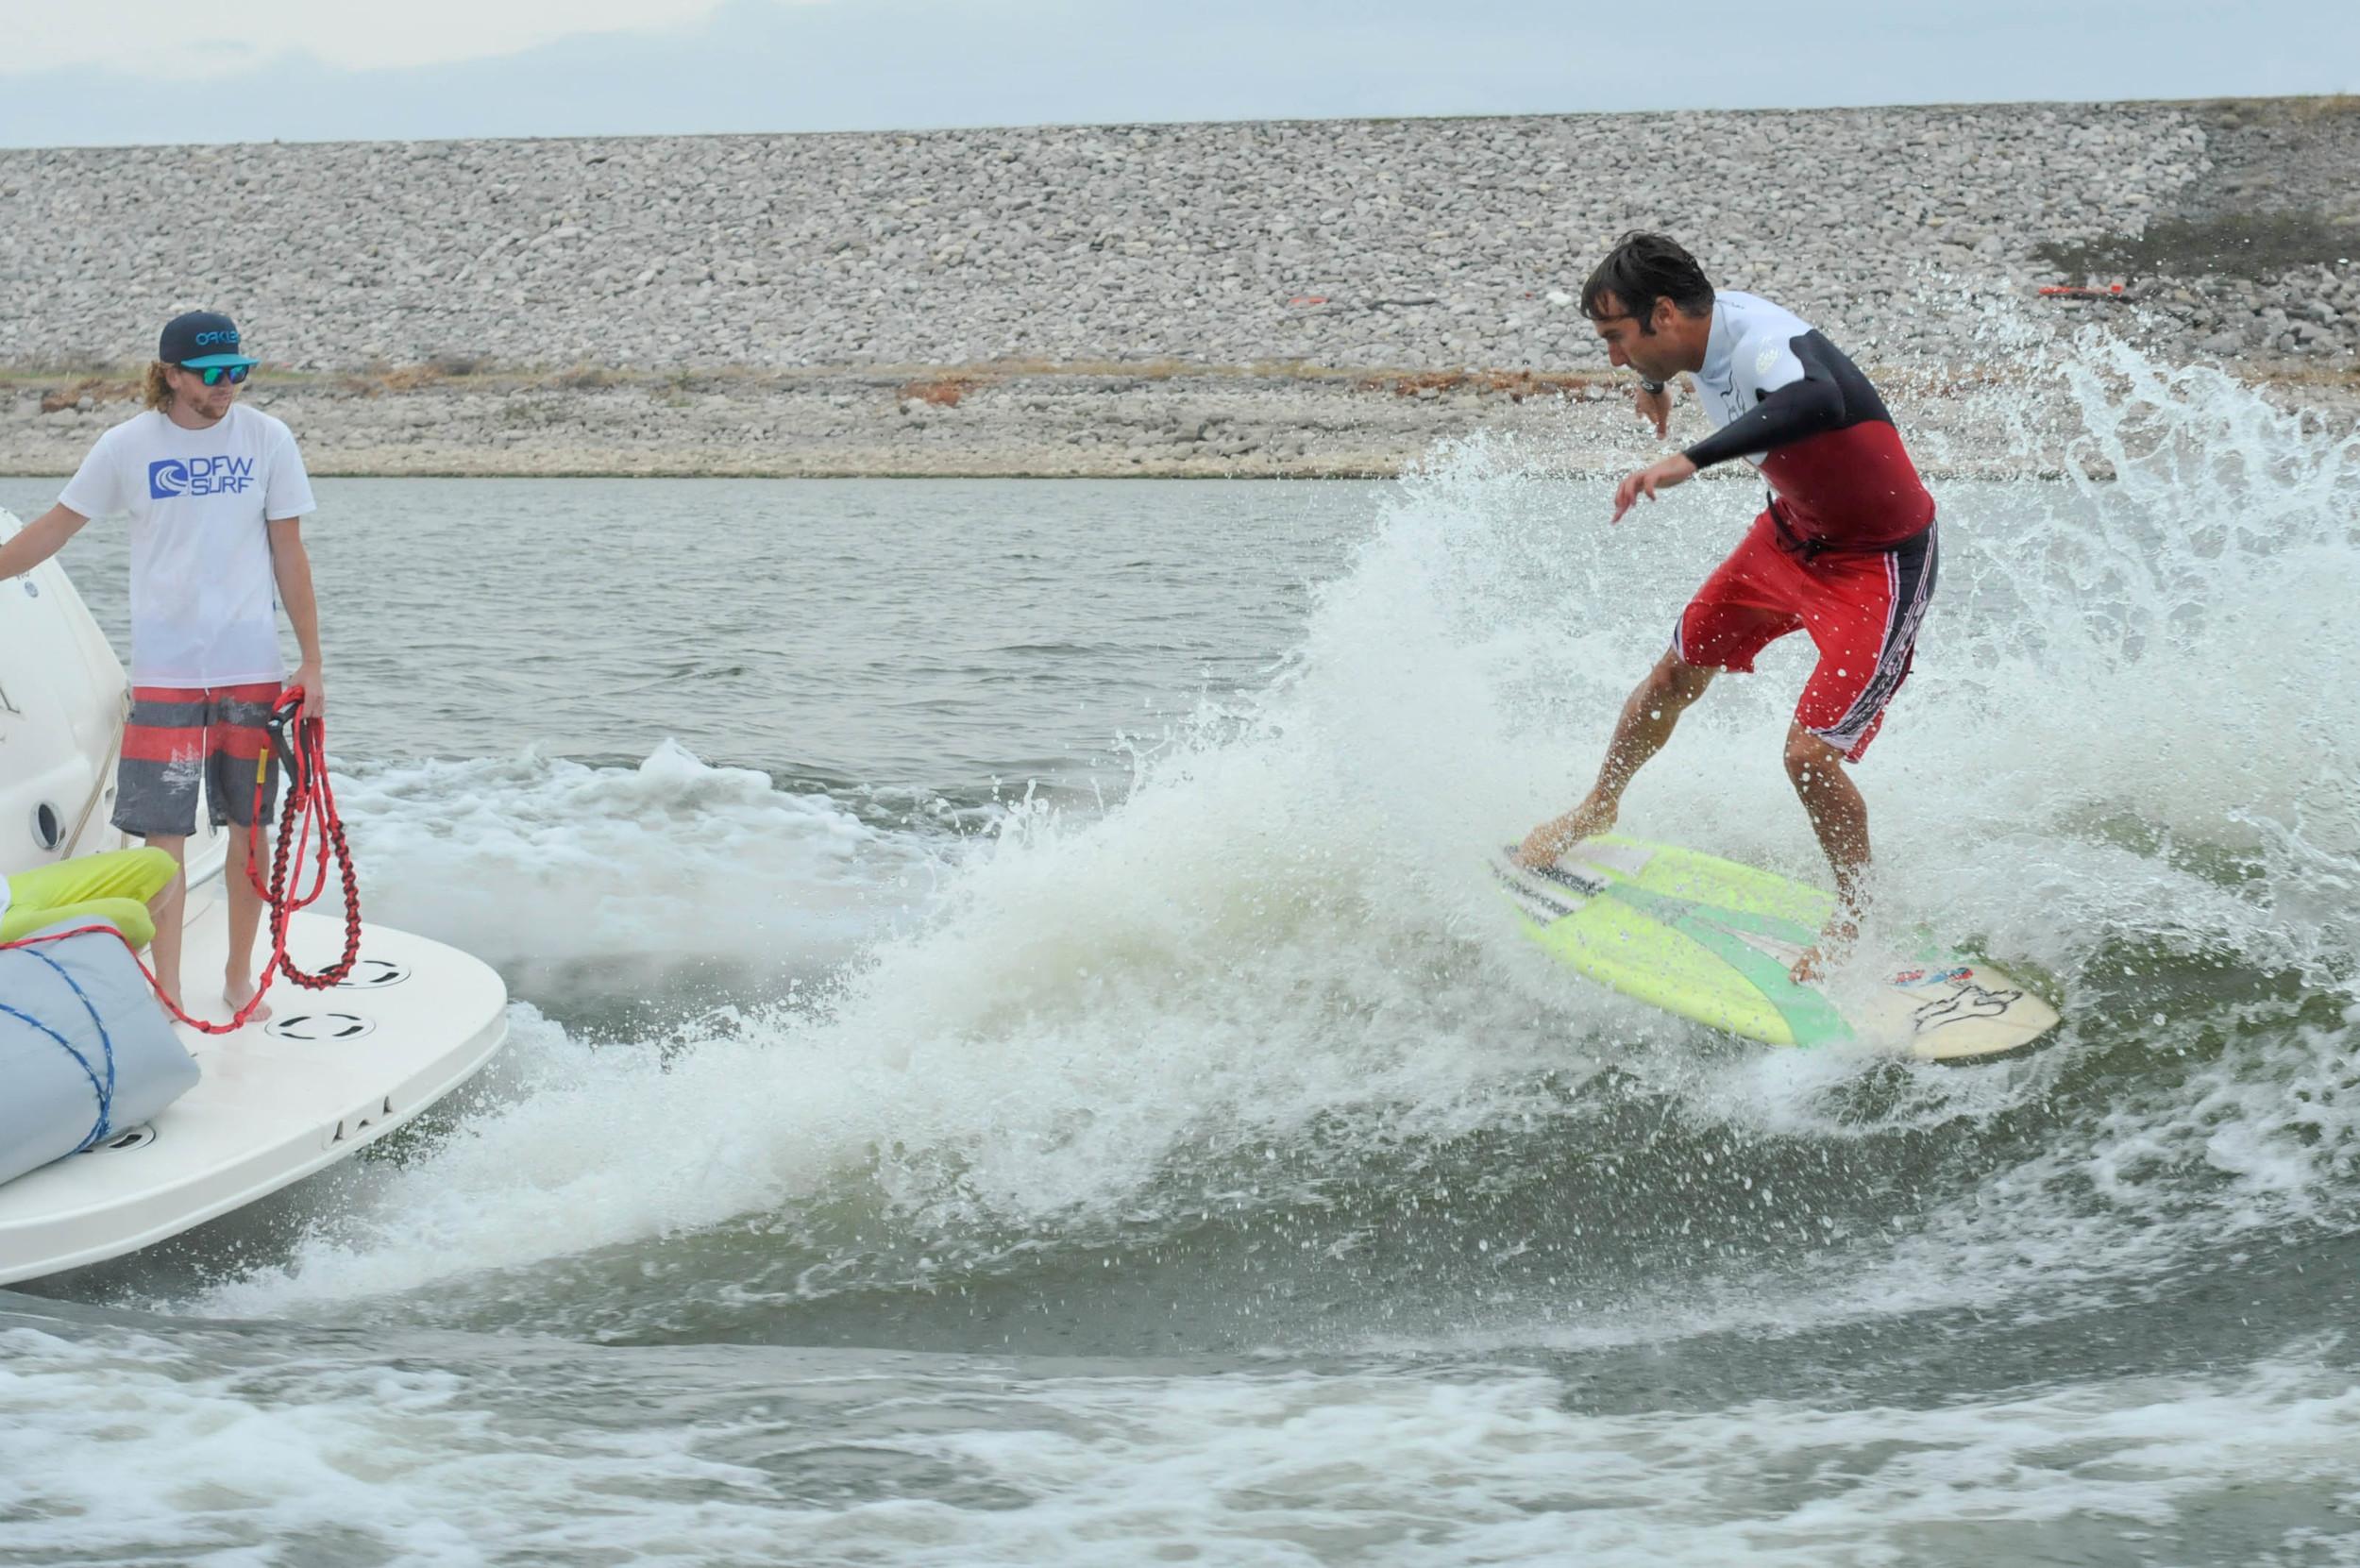 Josh Surfing at the 2013 Big Boat Invitational